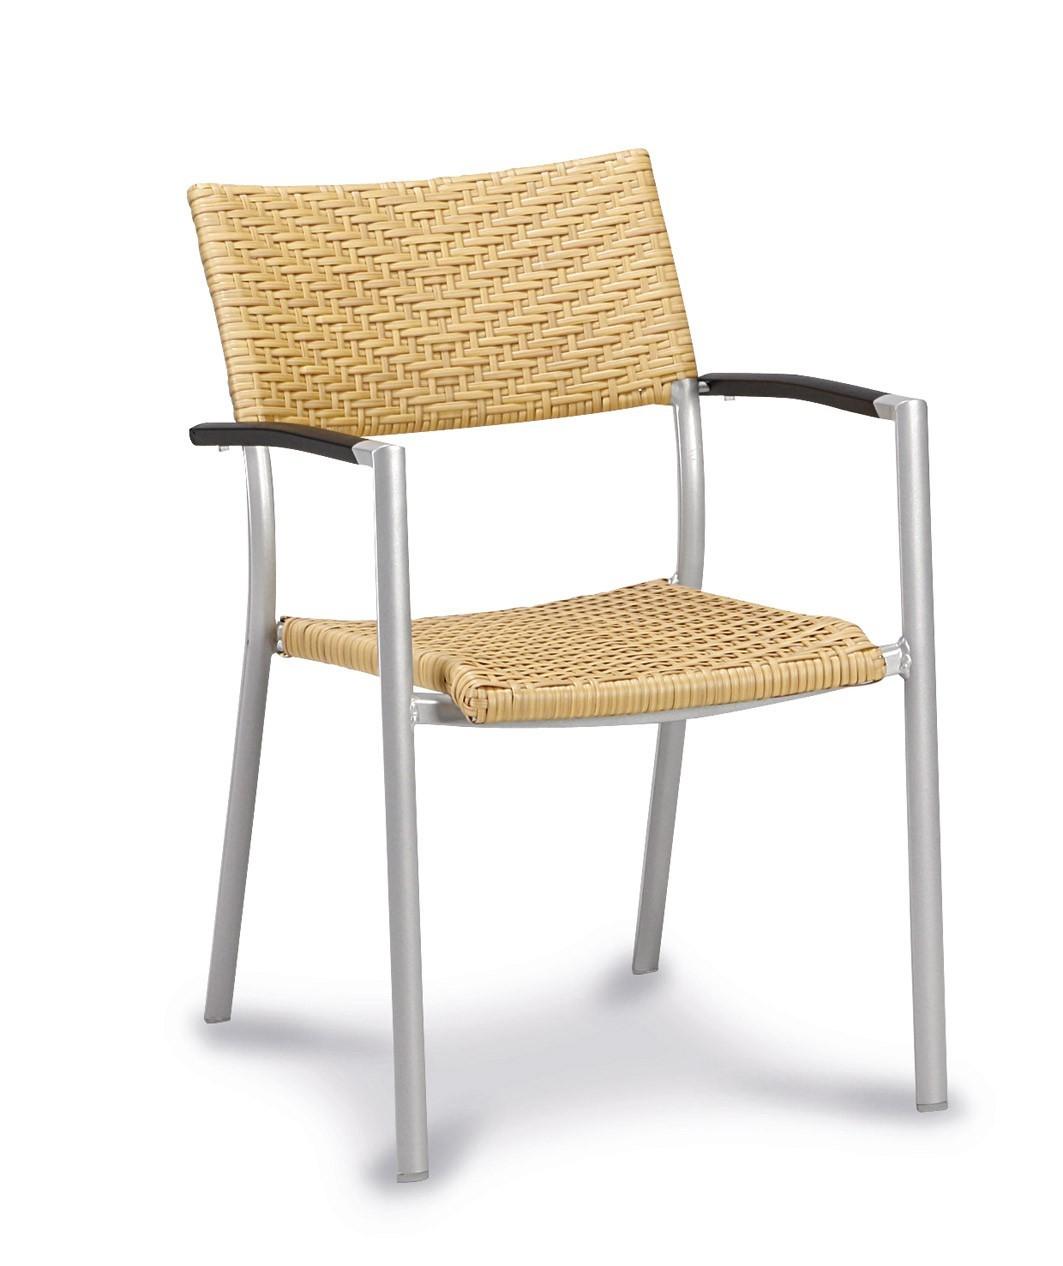 gartensessel albany stapelbar alu silber polyrattan natur bei. Black Bedroom Furniture Sets. Home Design Ideas